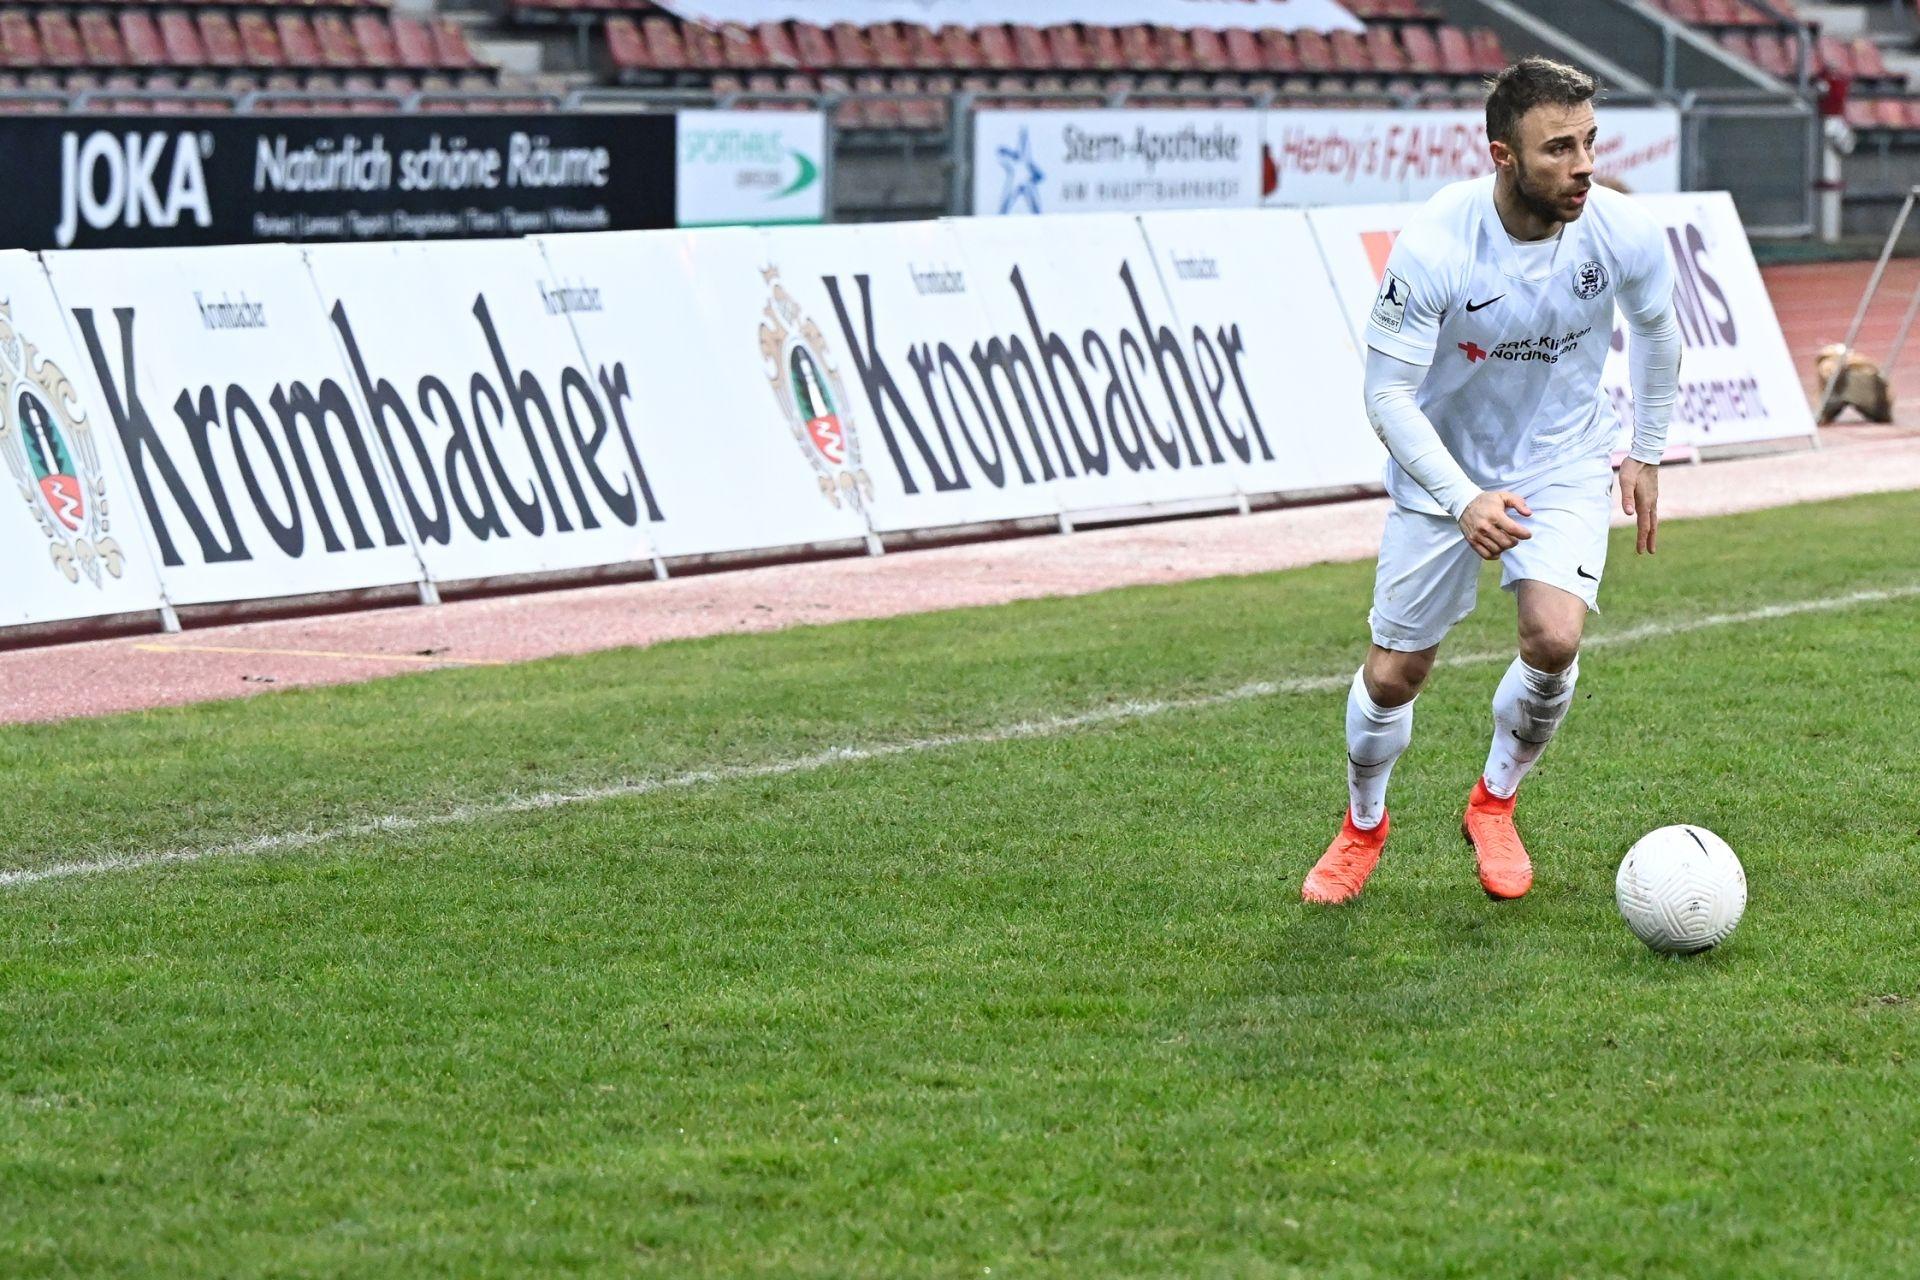 Regionalliga Südwest 2020/21, KSVHessen Kassel, TSV Steinbach Haiger, Endstand 2:1, Alban Meha